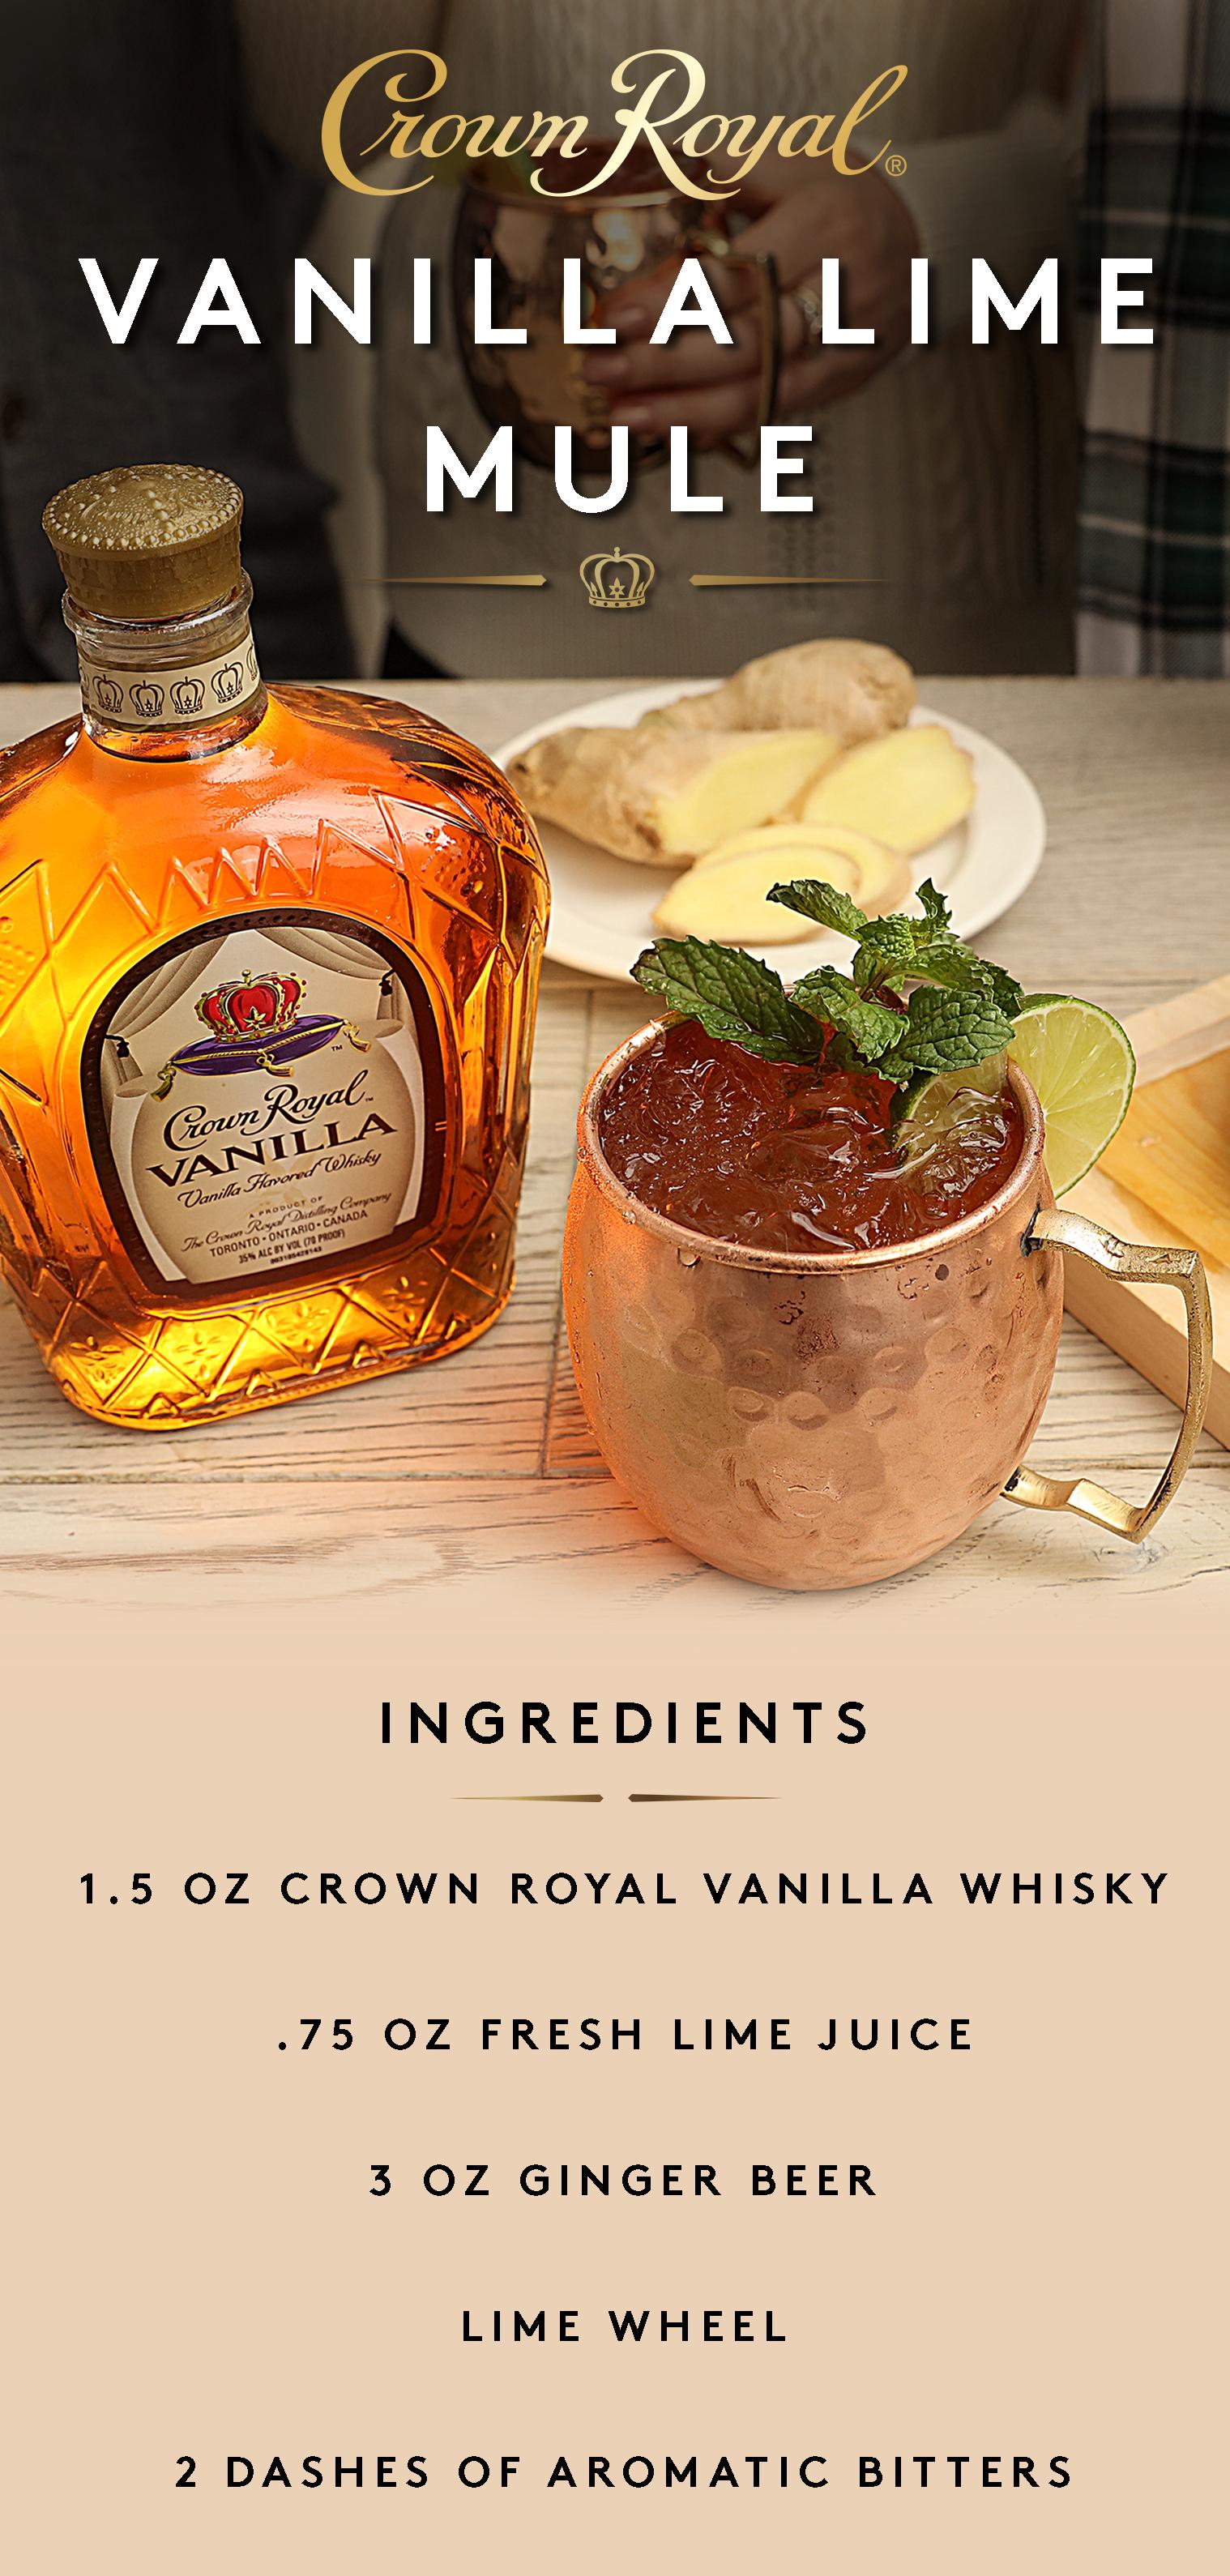 Vanilla Lime Mule | Pinterest | Mule recipe, Aromatic bitters and ...